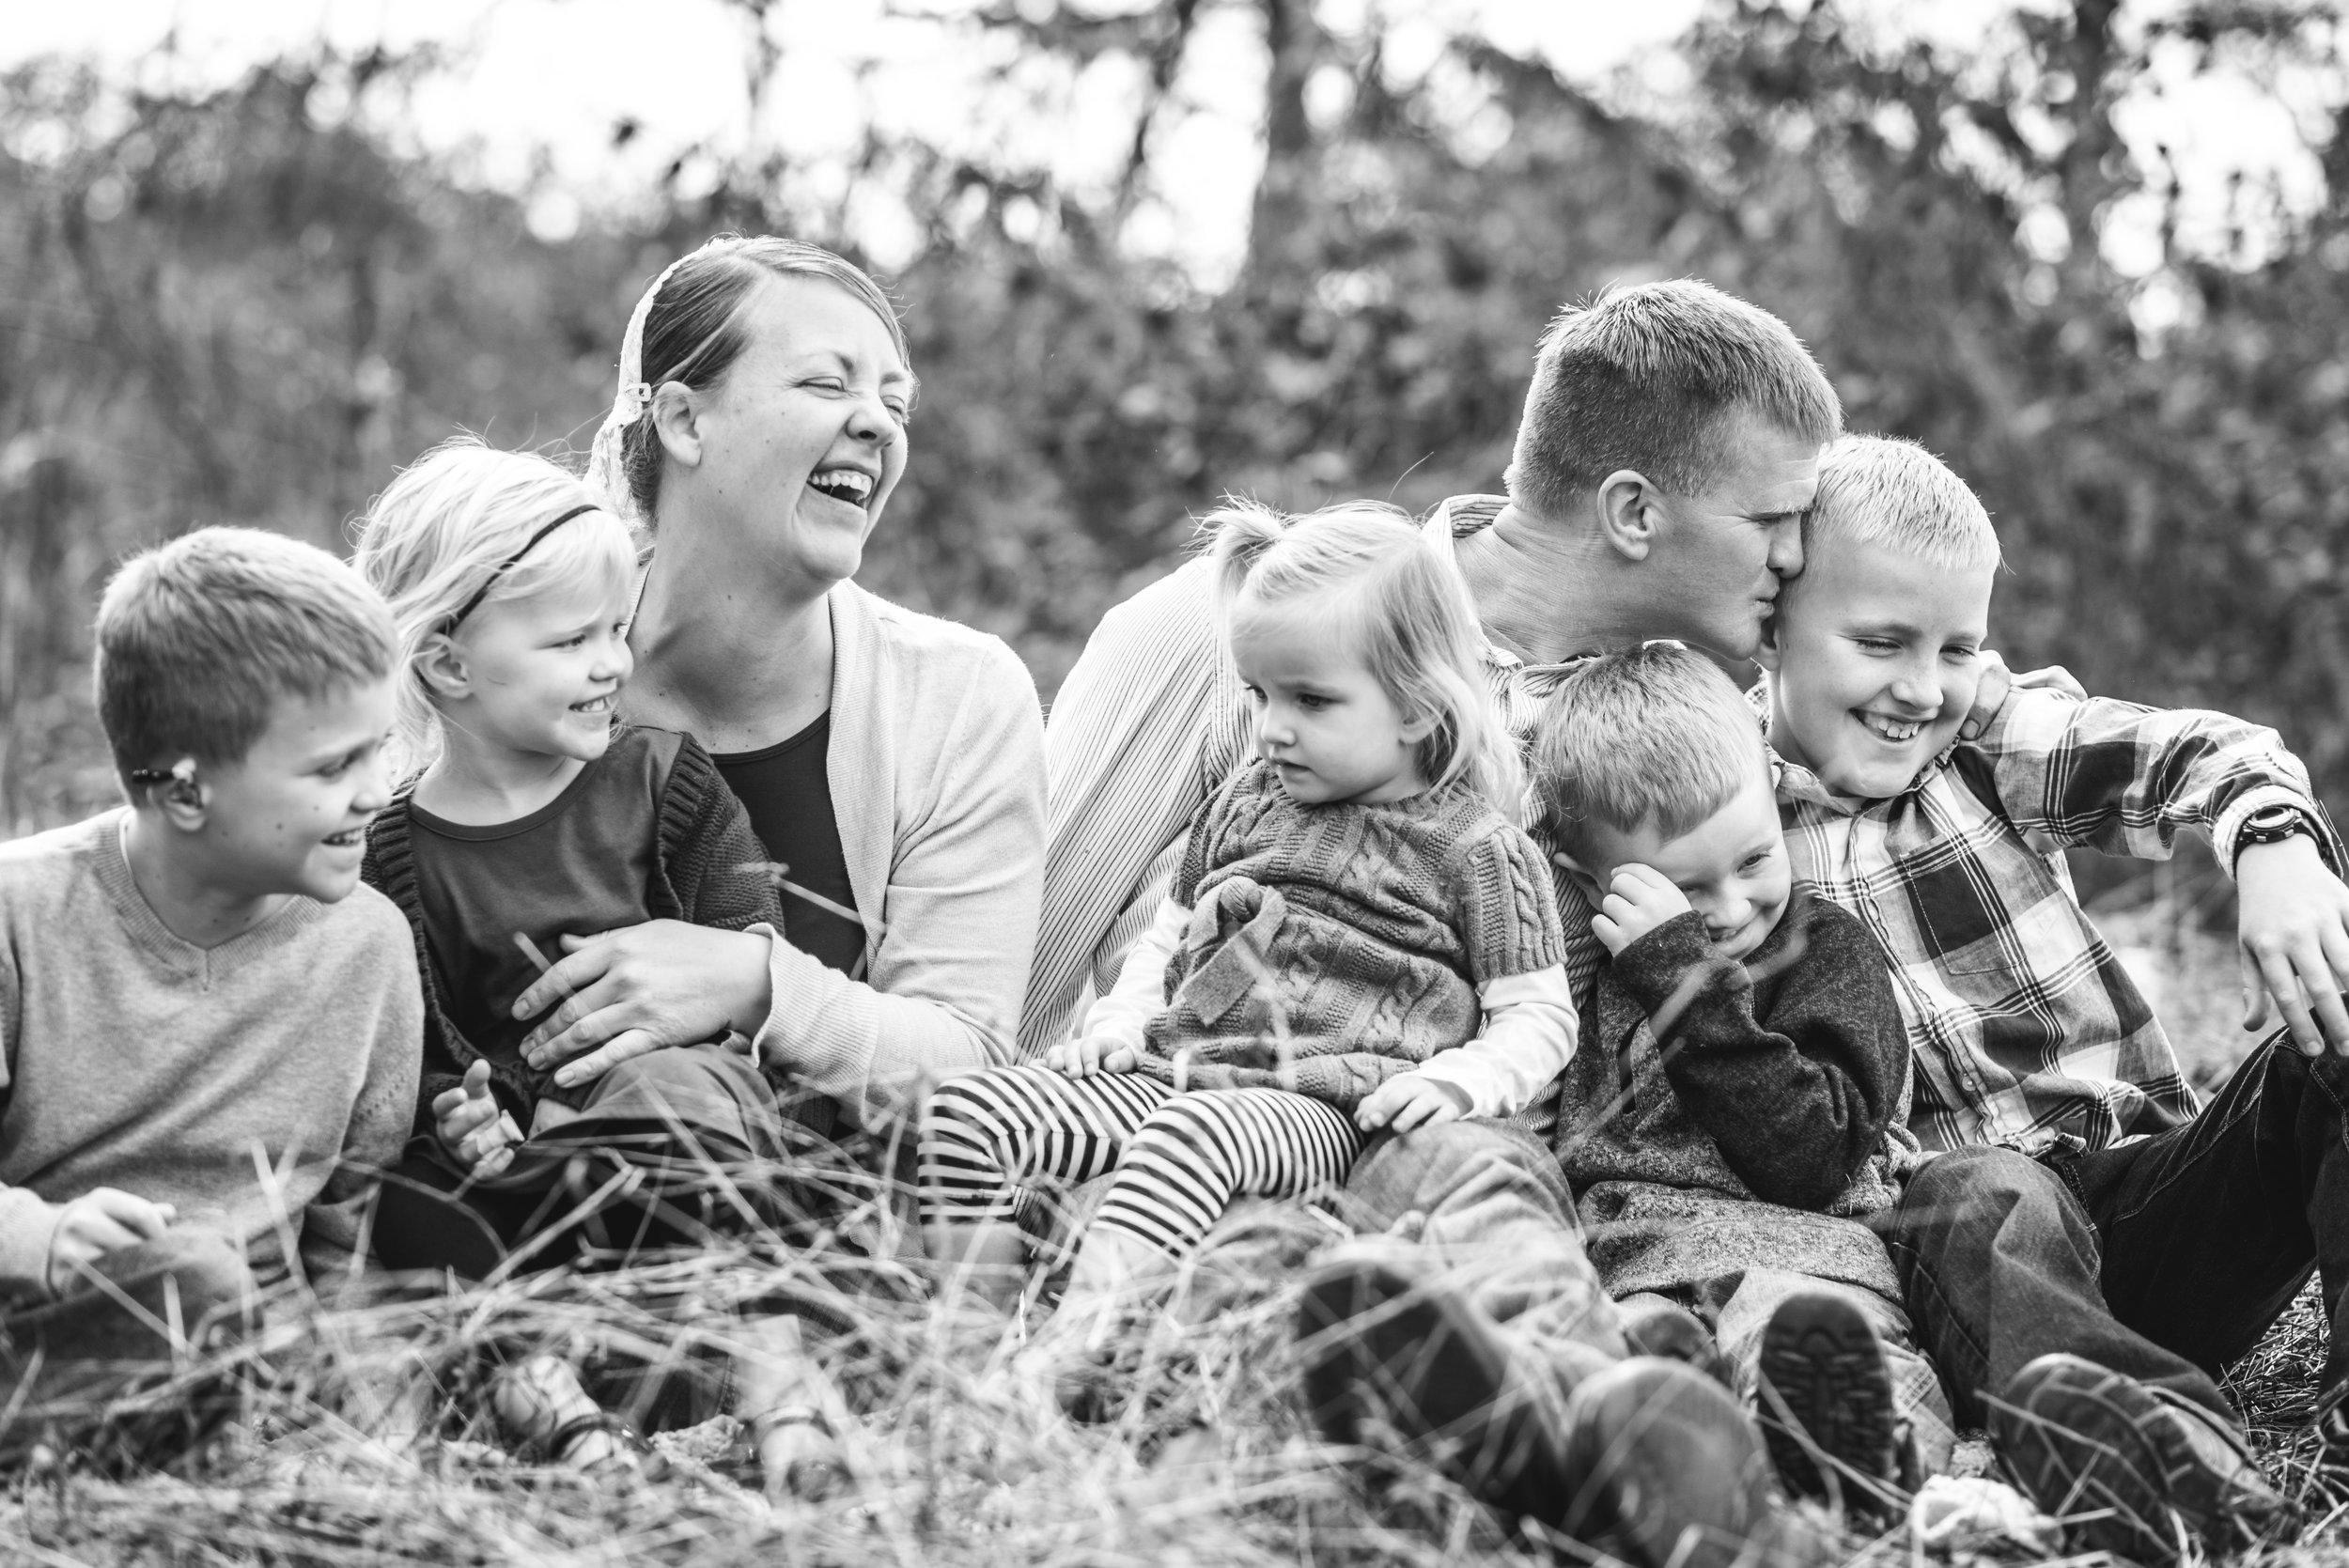 christi-stoner-photography-lancaster-pa-lifestyle-family-outdoors